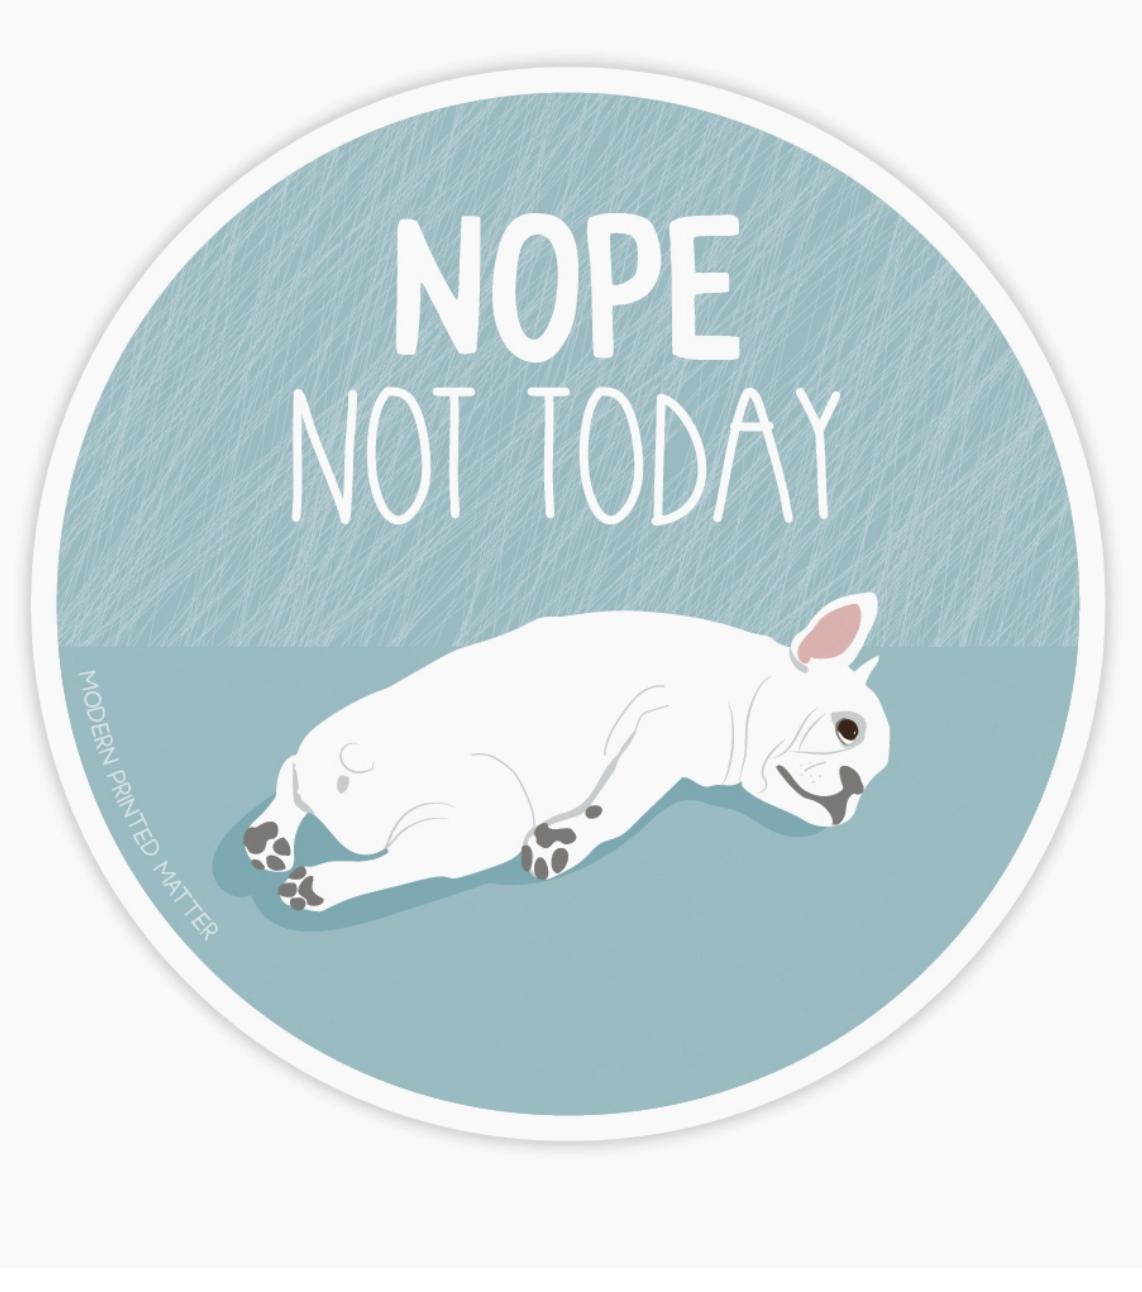 Modern Printed Matter Nope Not Today Sticker